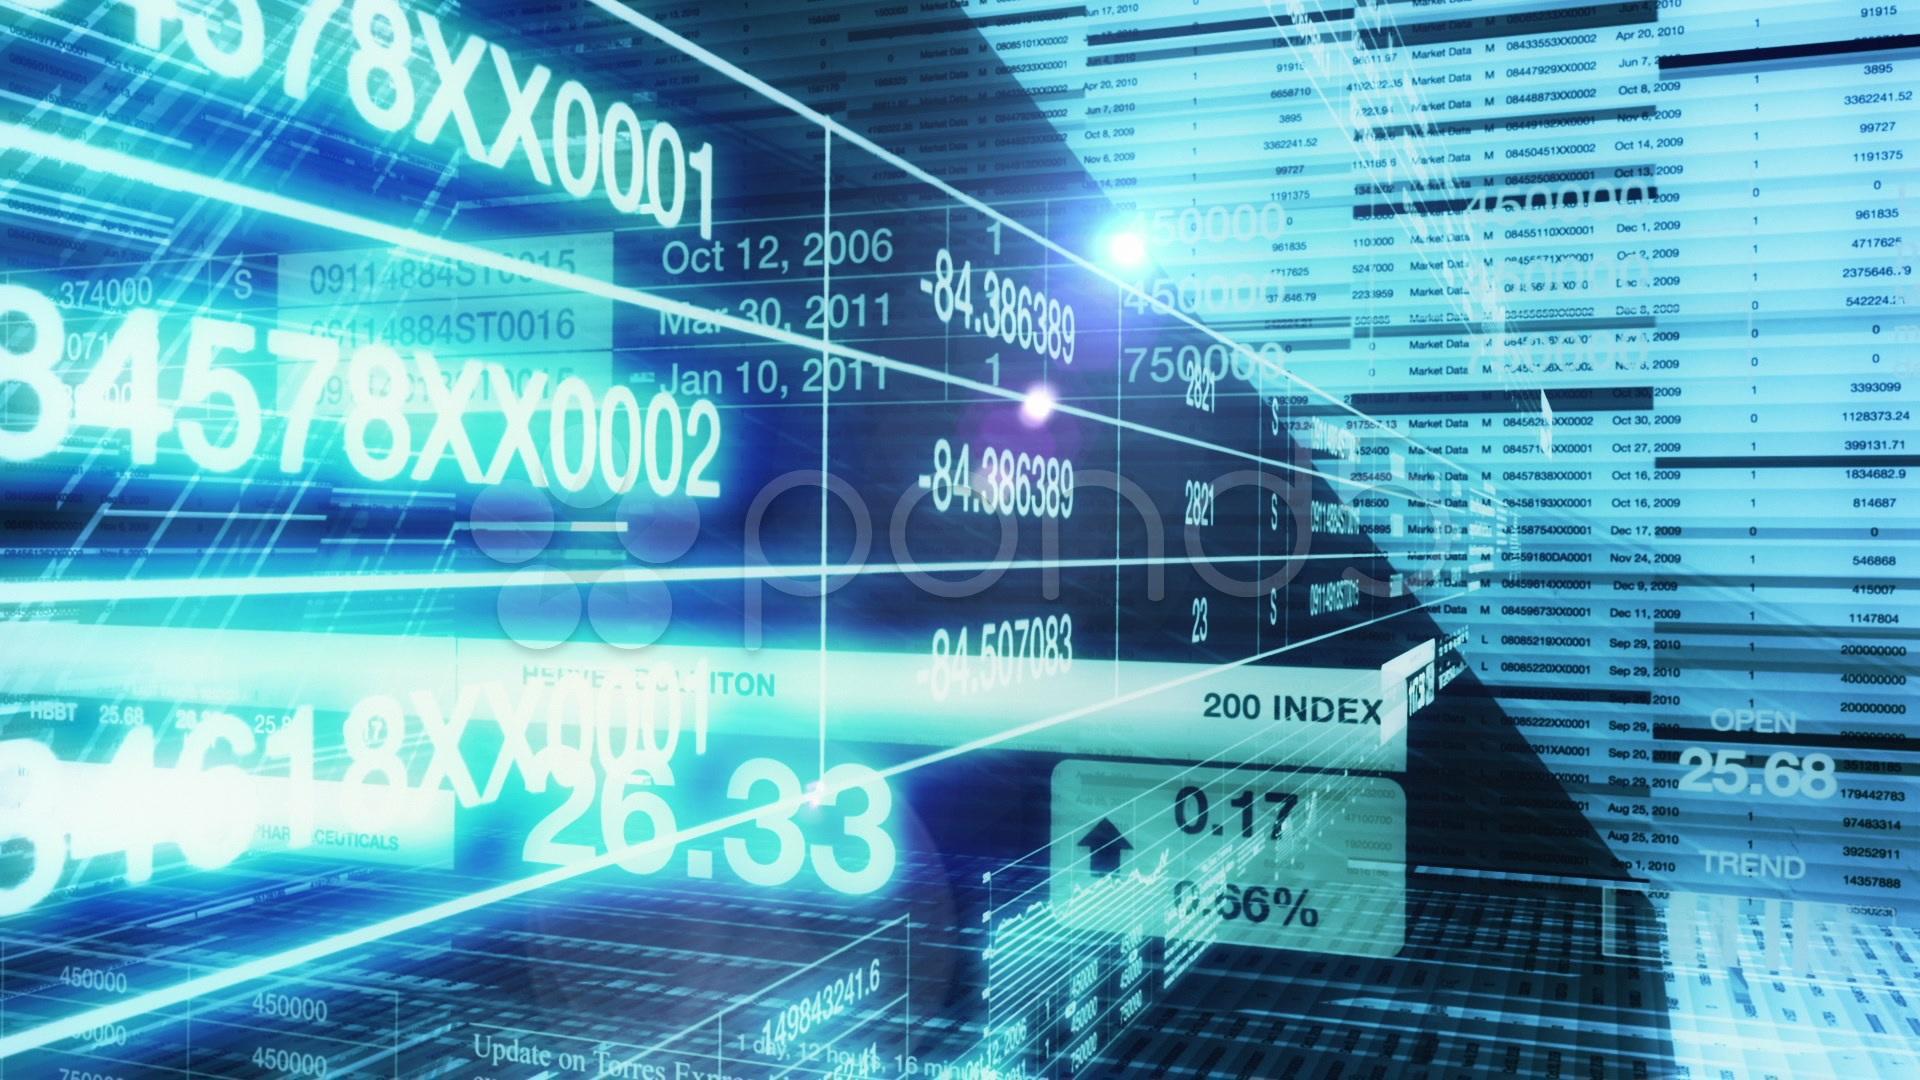 ۸ استارتآپ فناوری مالی که عصر جدید صنعت انتقال پول را تعریف کردند